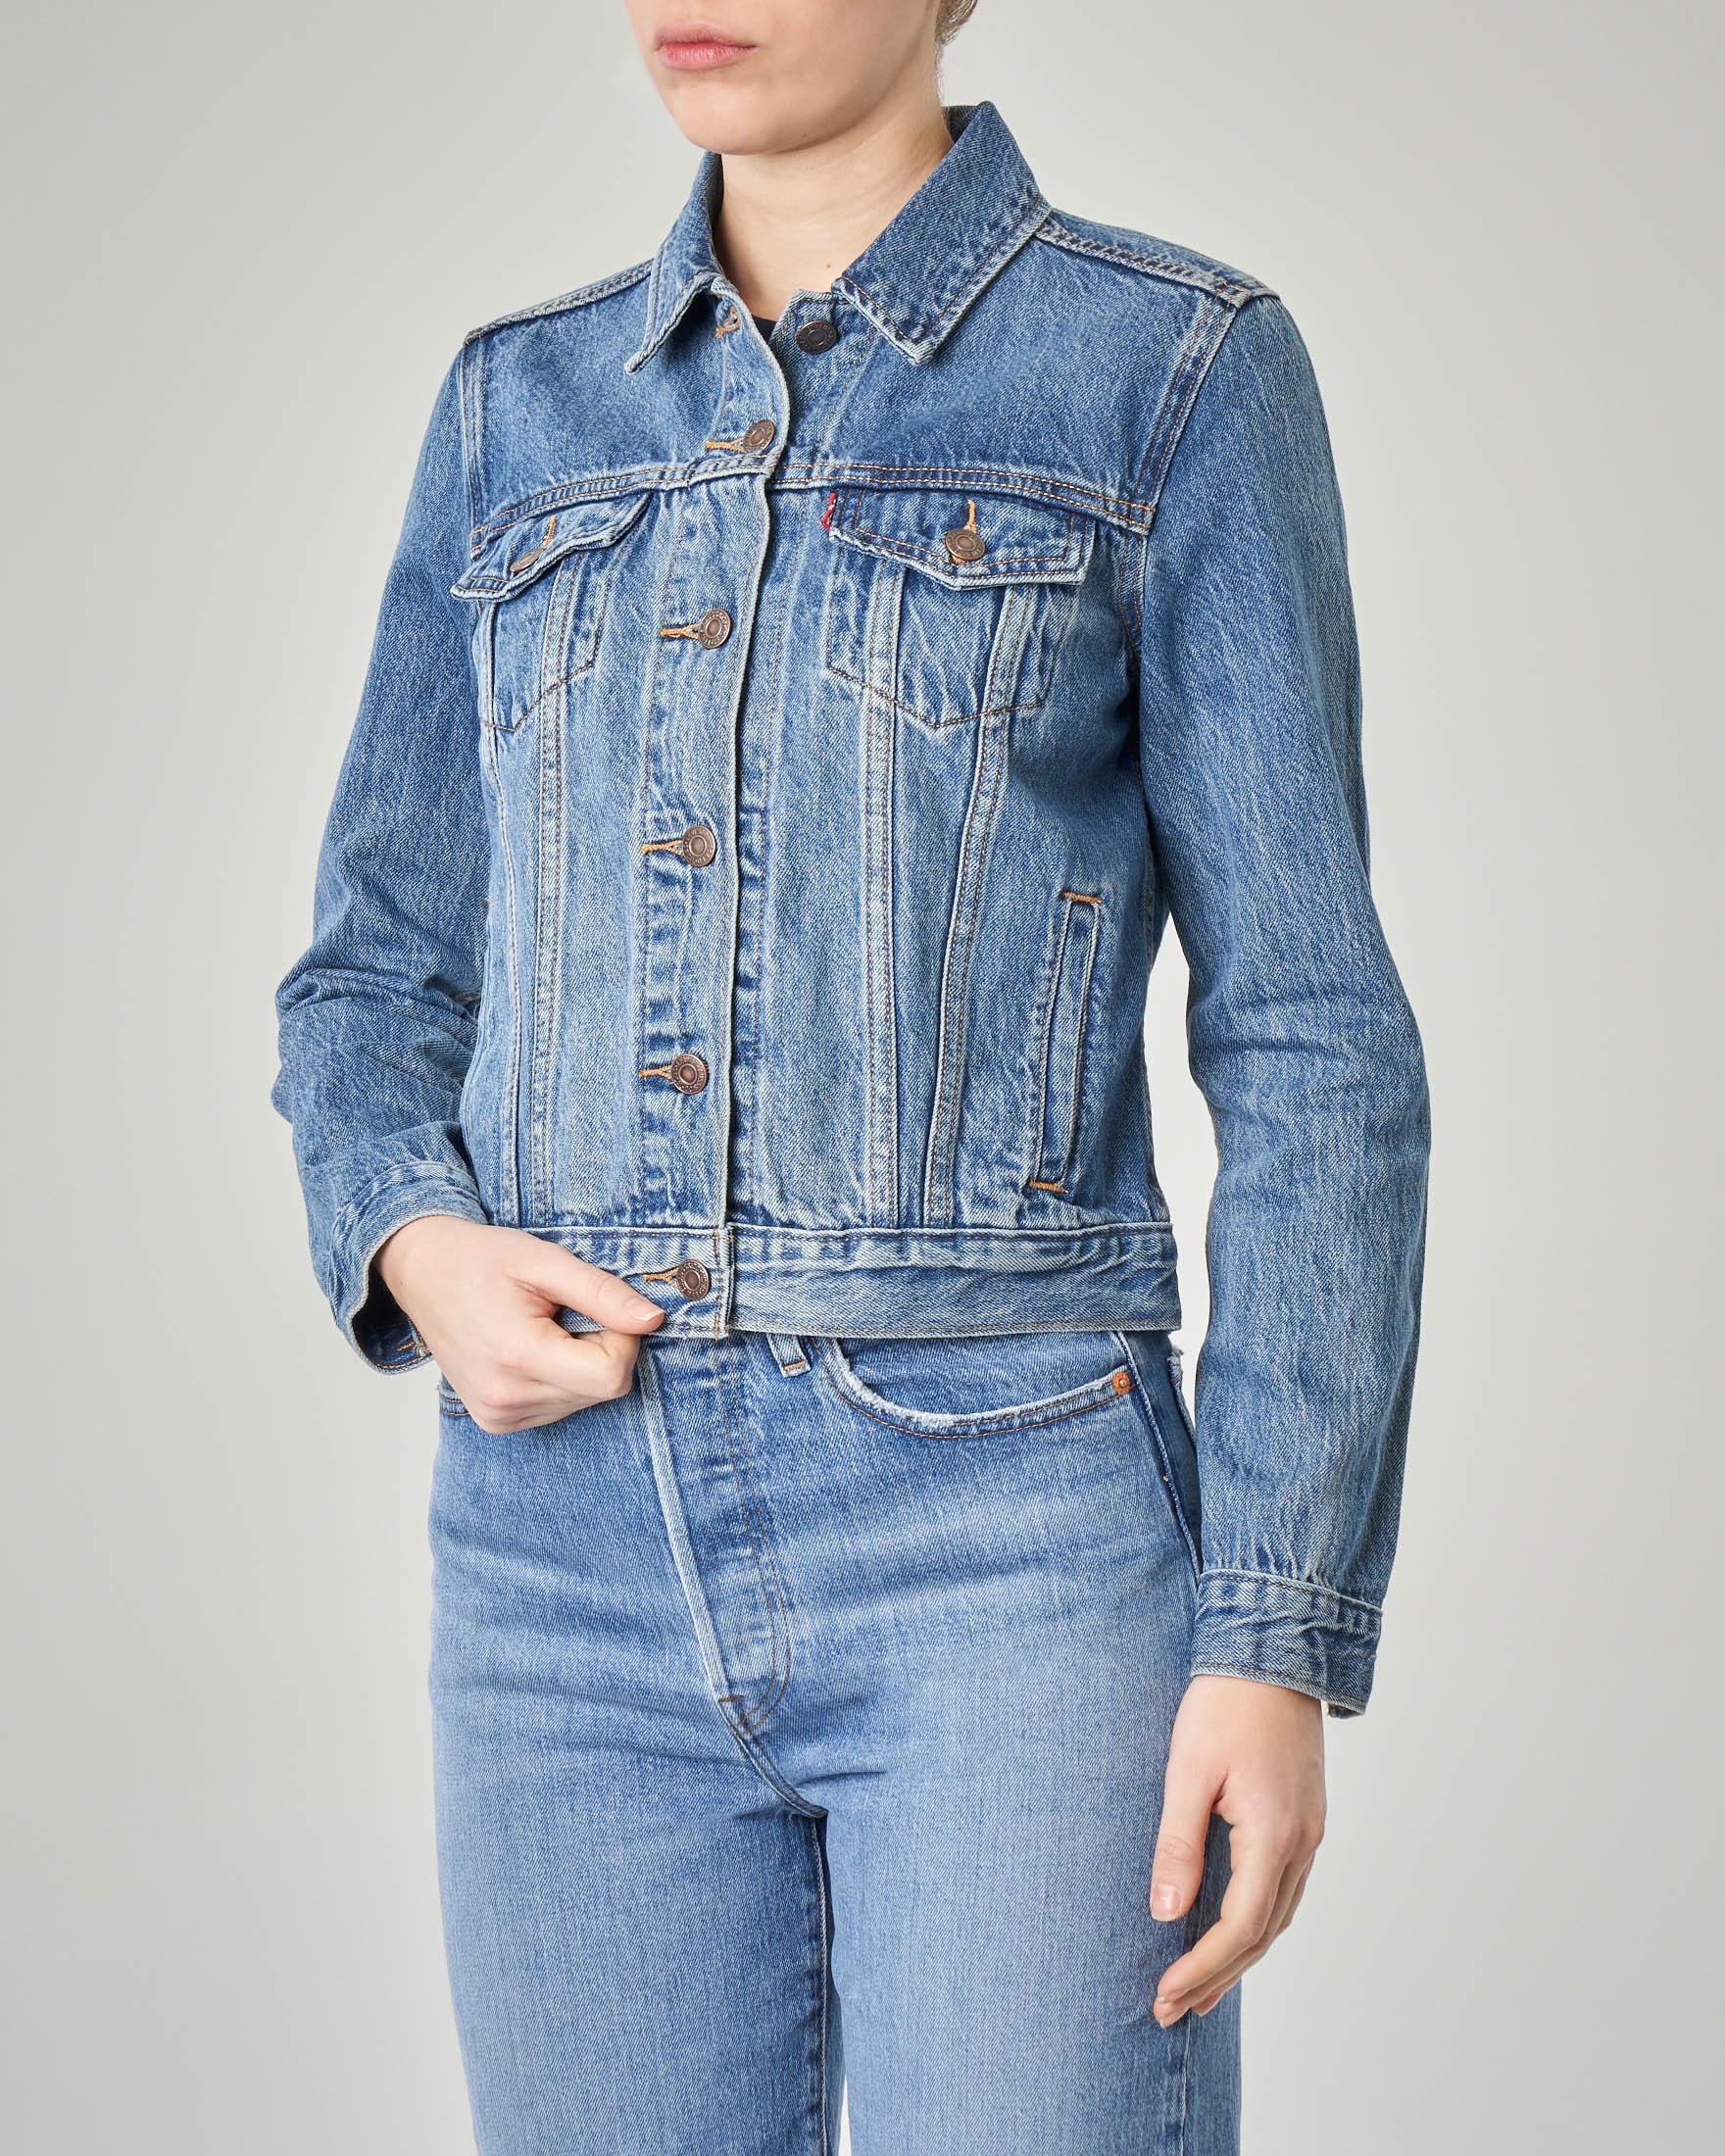 Giubbino in jeans blu